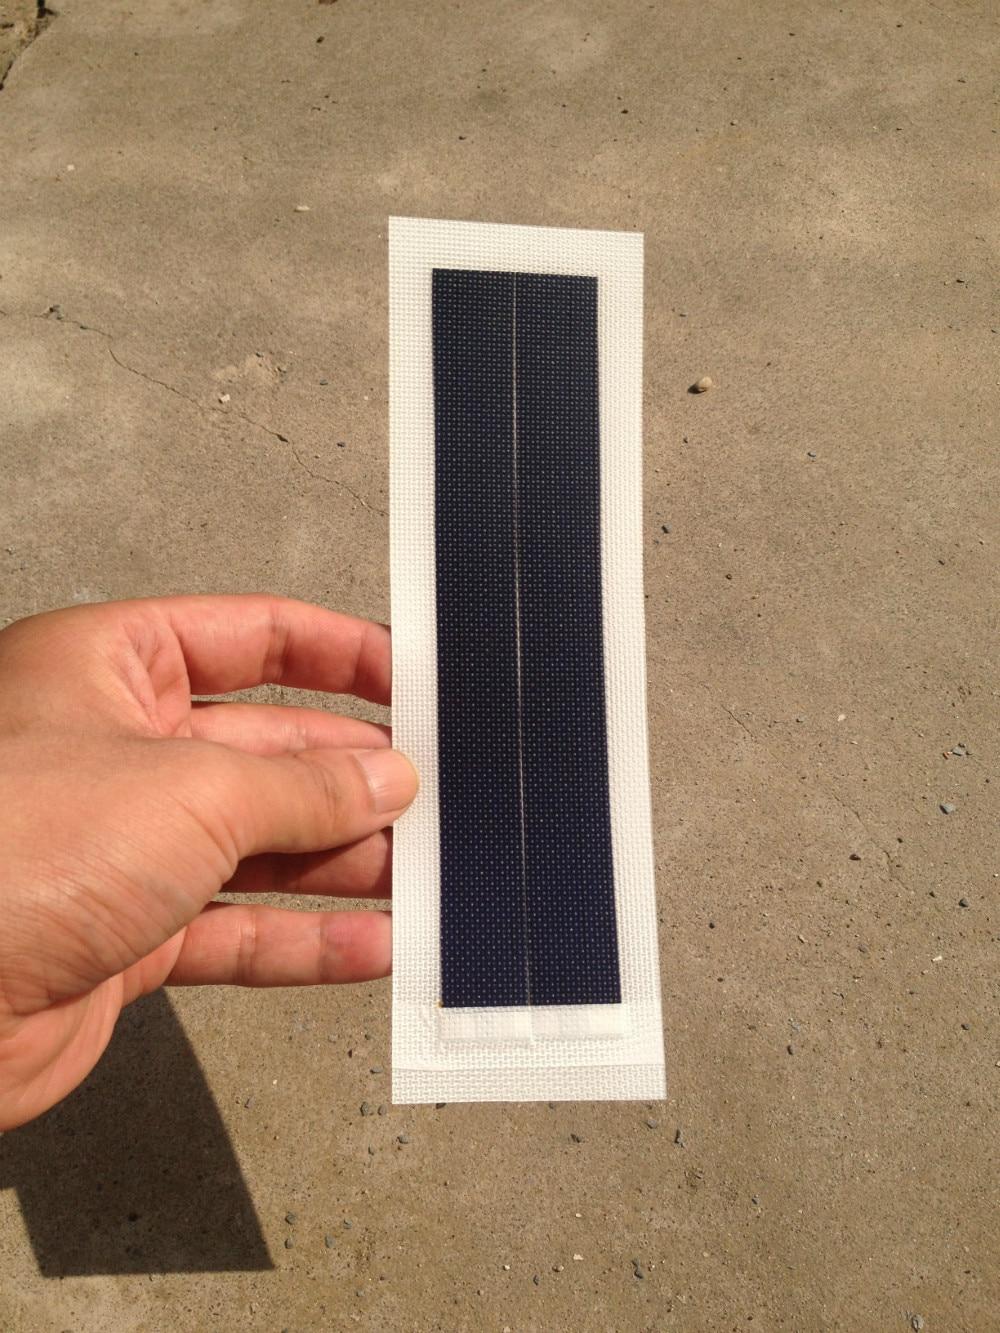 Batería recargable para sistema de energía solar móvil, panel solar personalizado profesional de 1w, 3V, 170MA, para iluminación del hogar